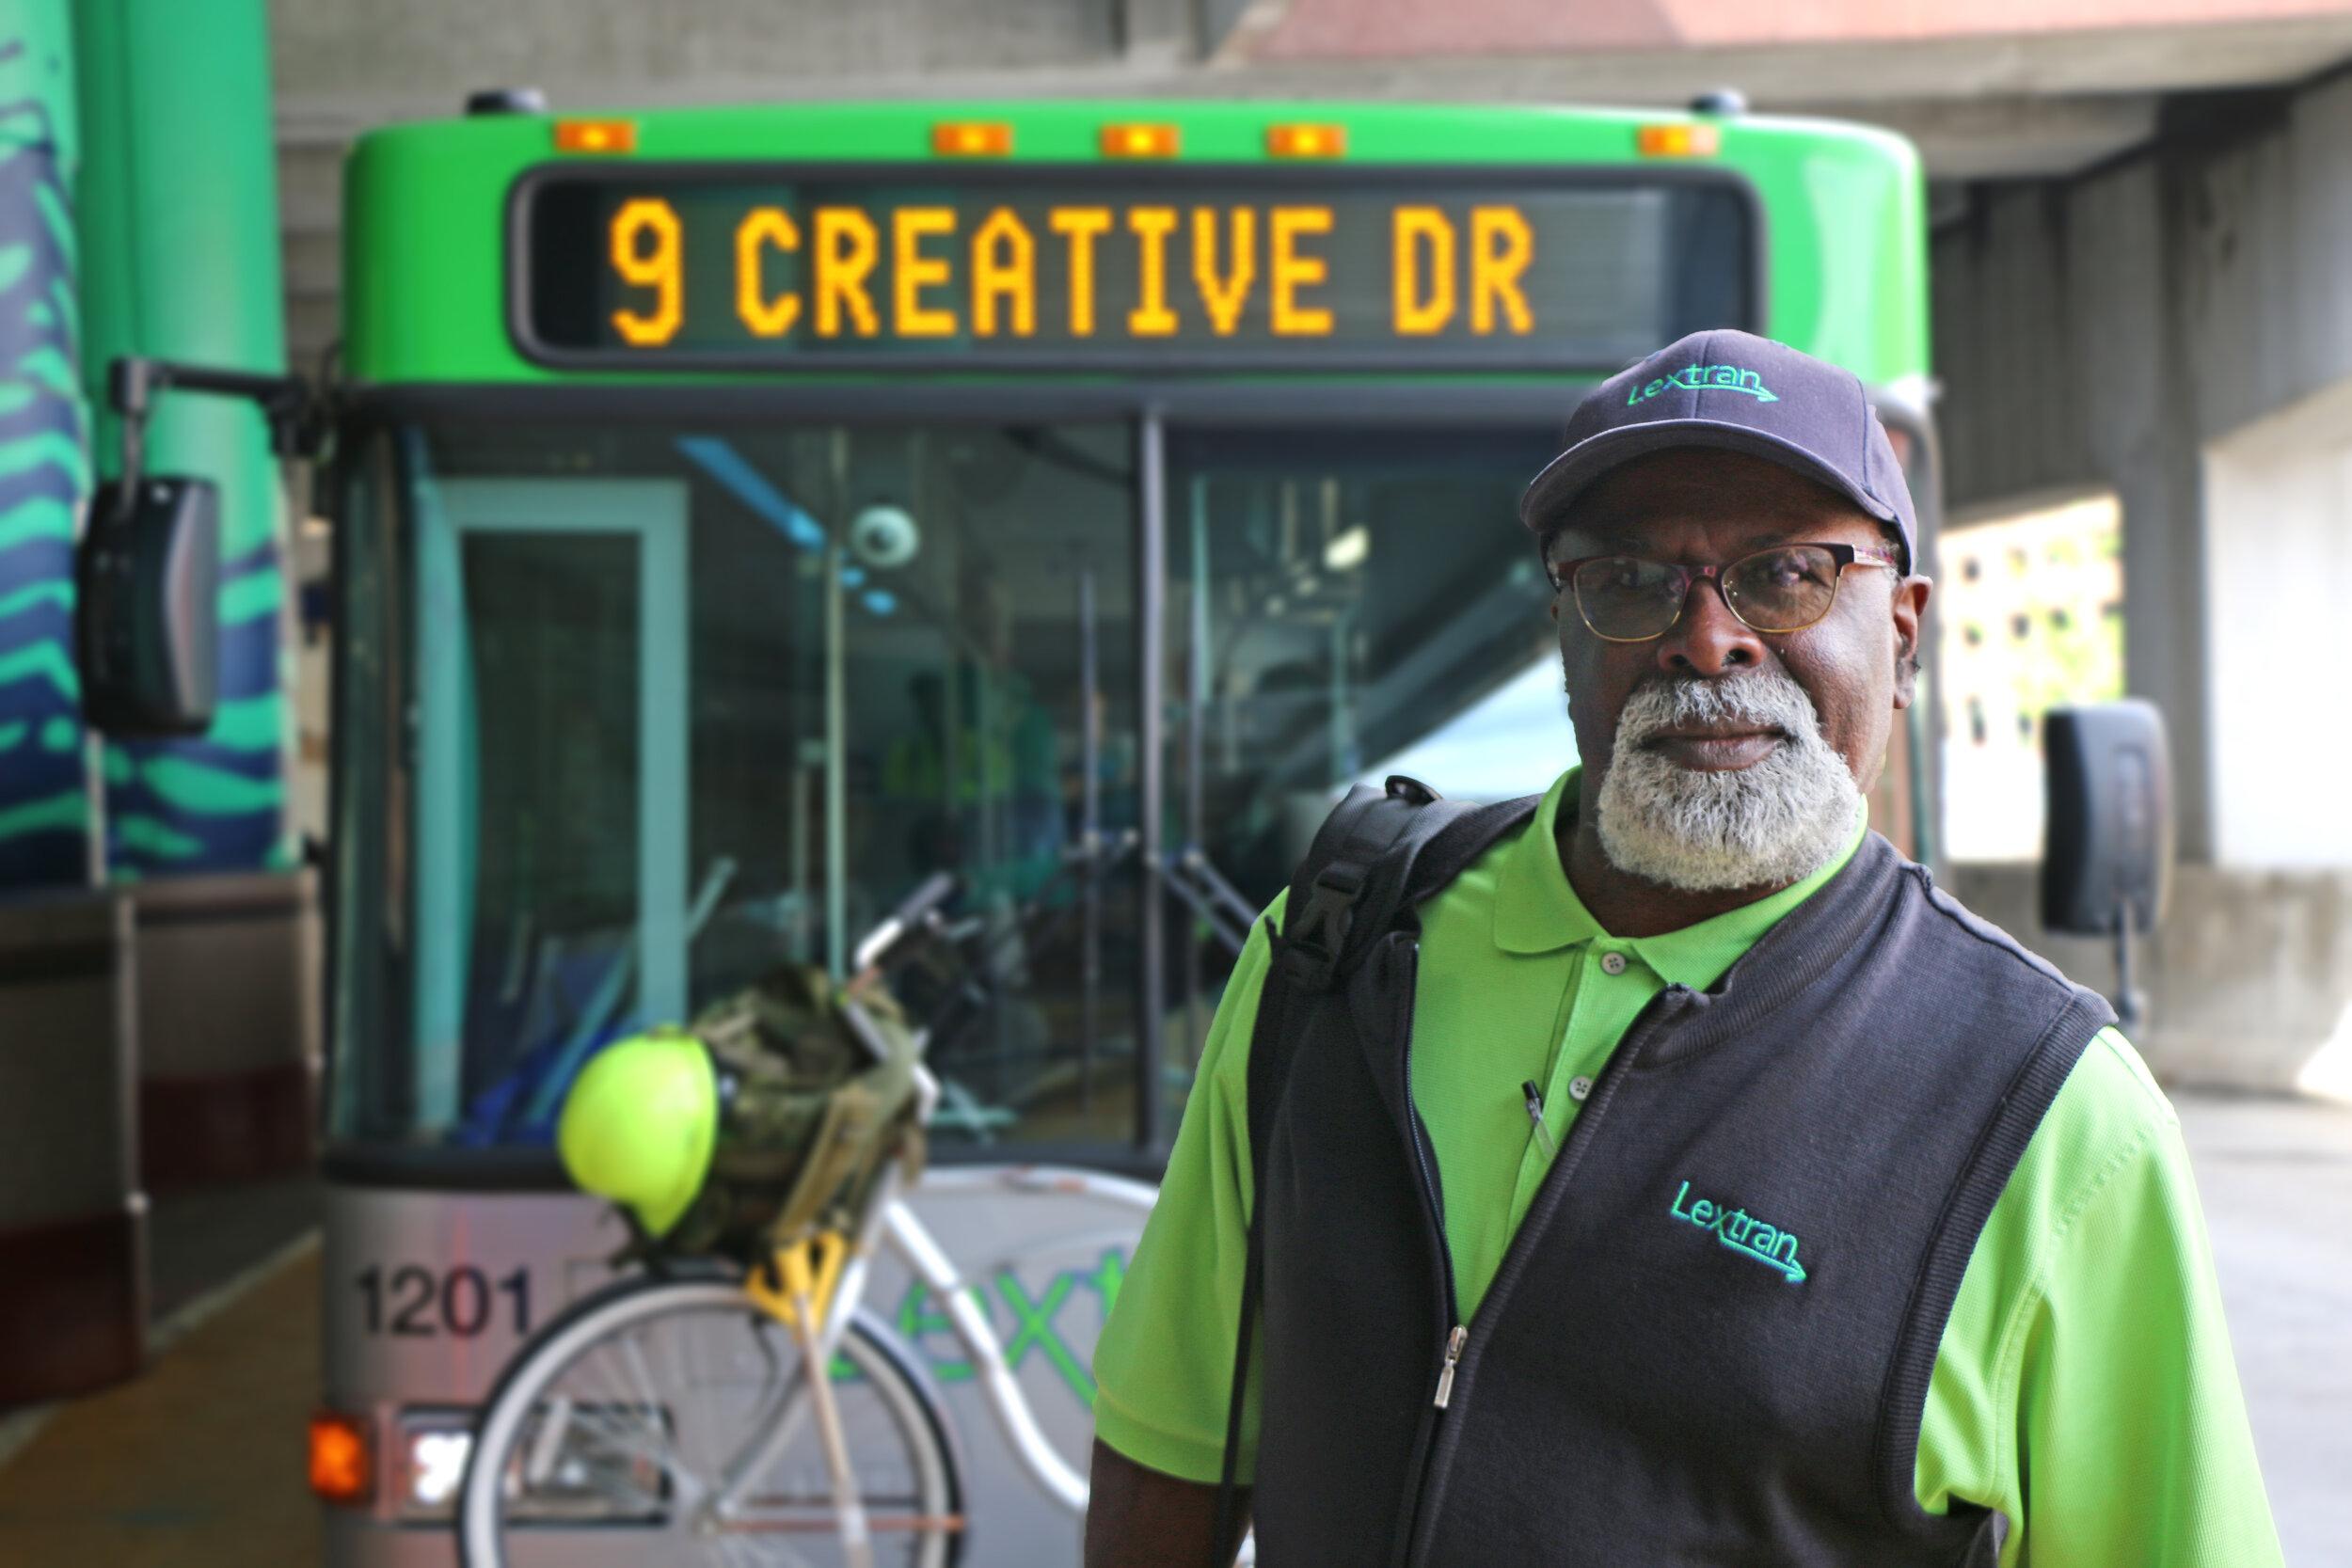 Operator_Bike_Transit_Center.JPG